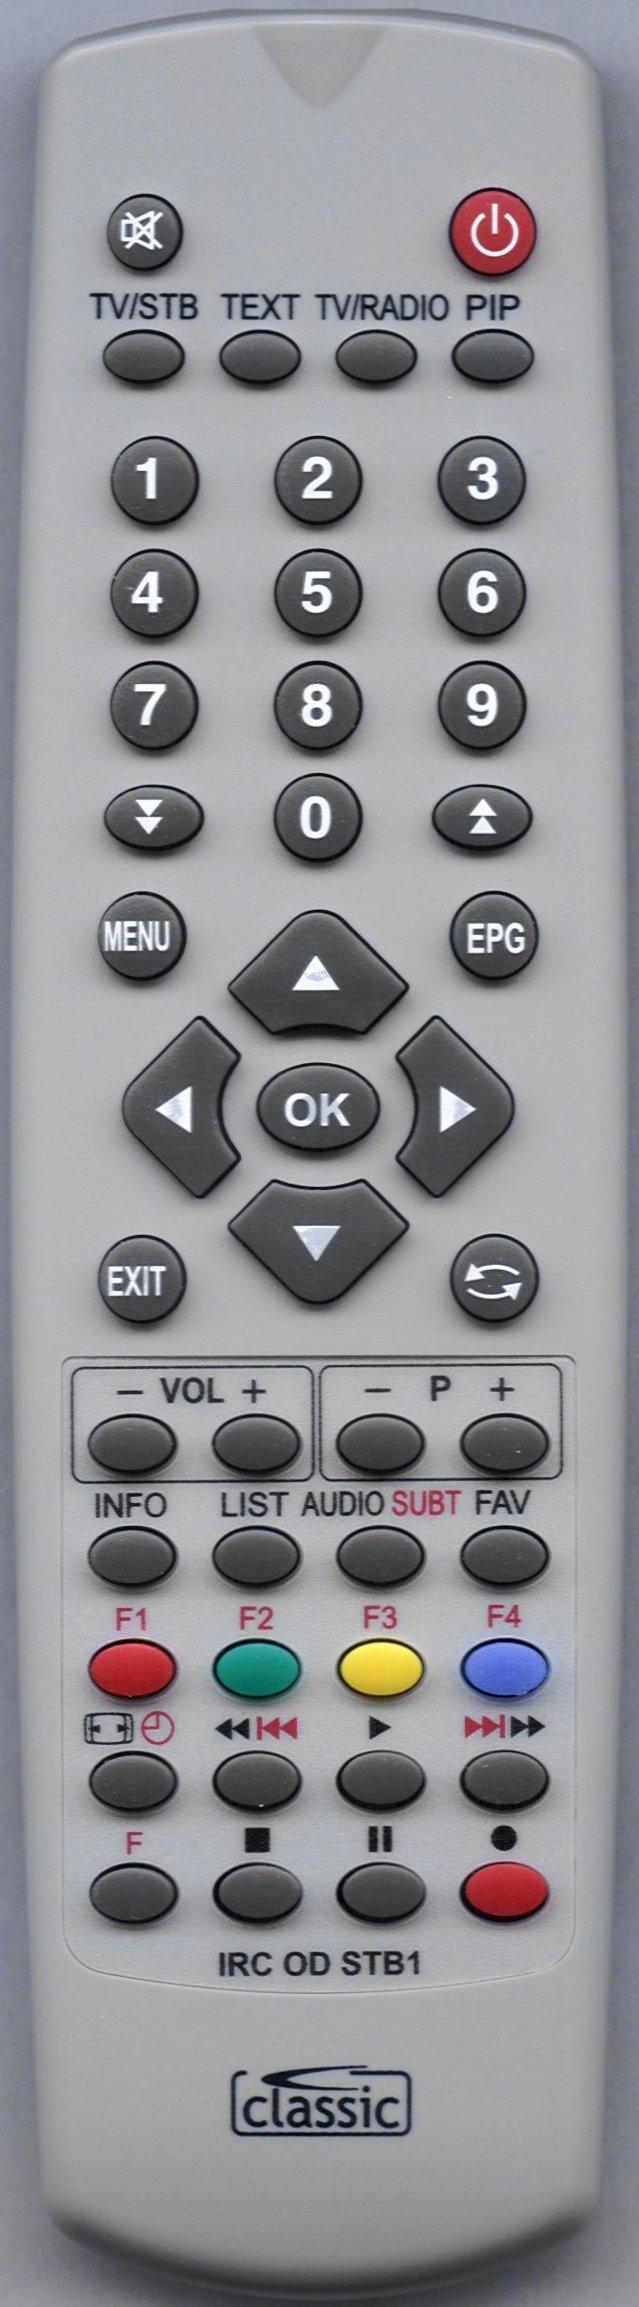 TOPFIELD TF5810PVRT Remote Control